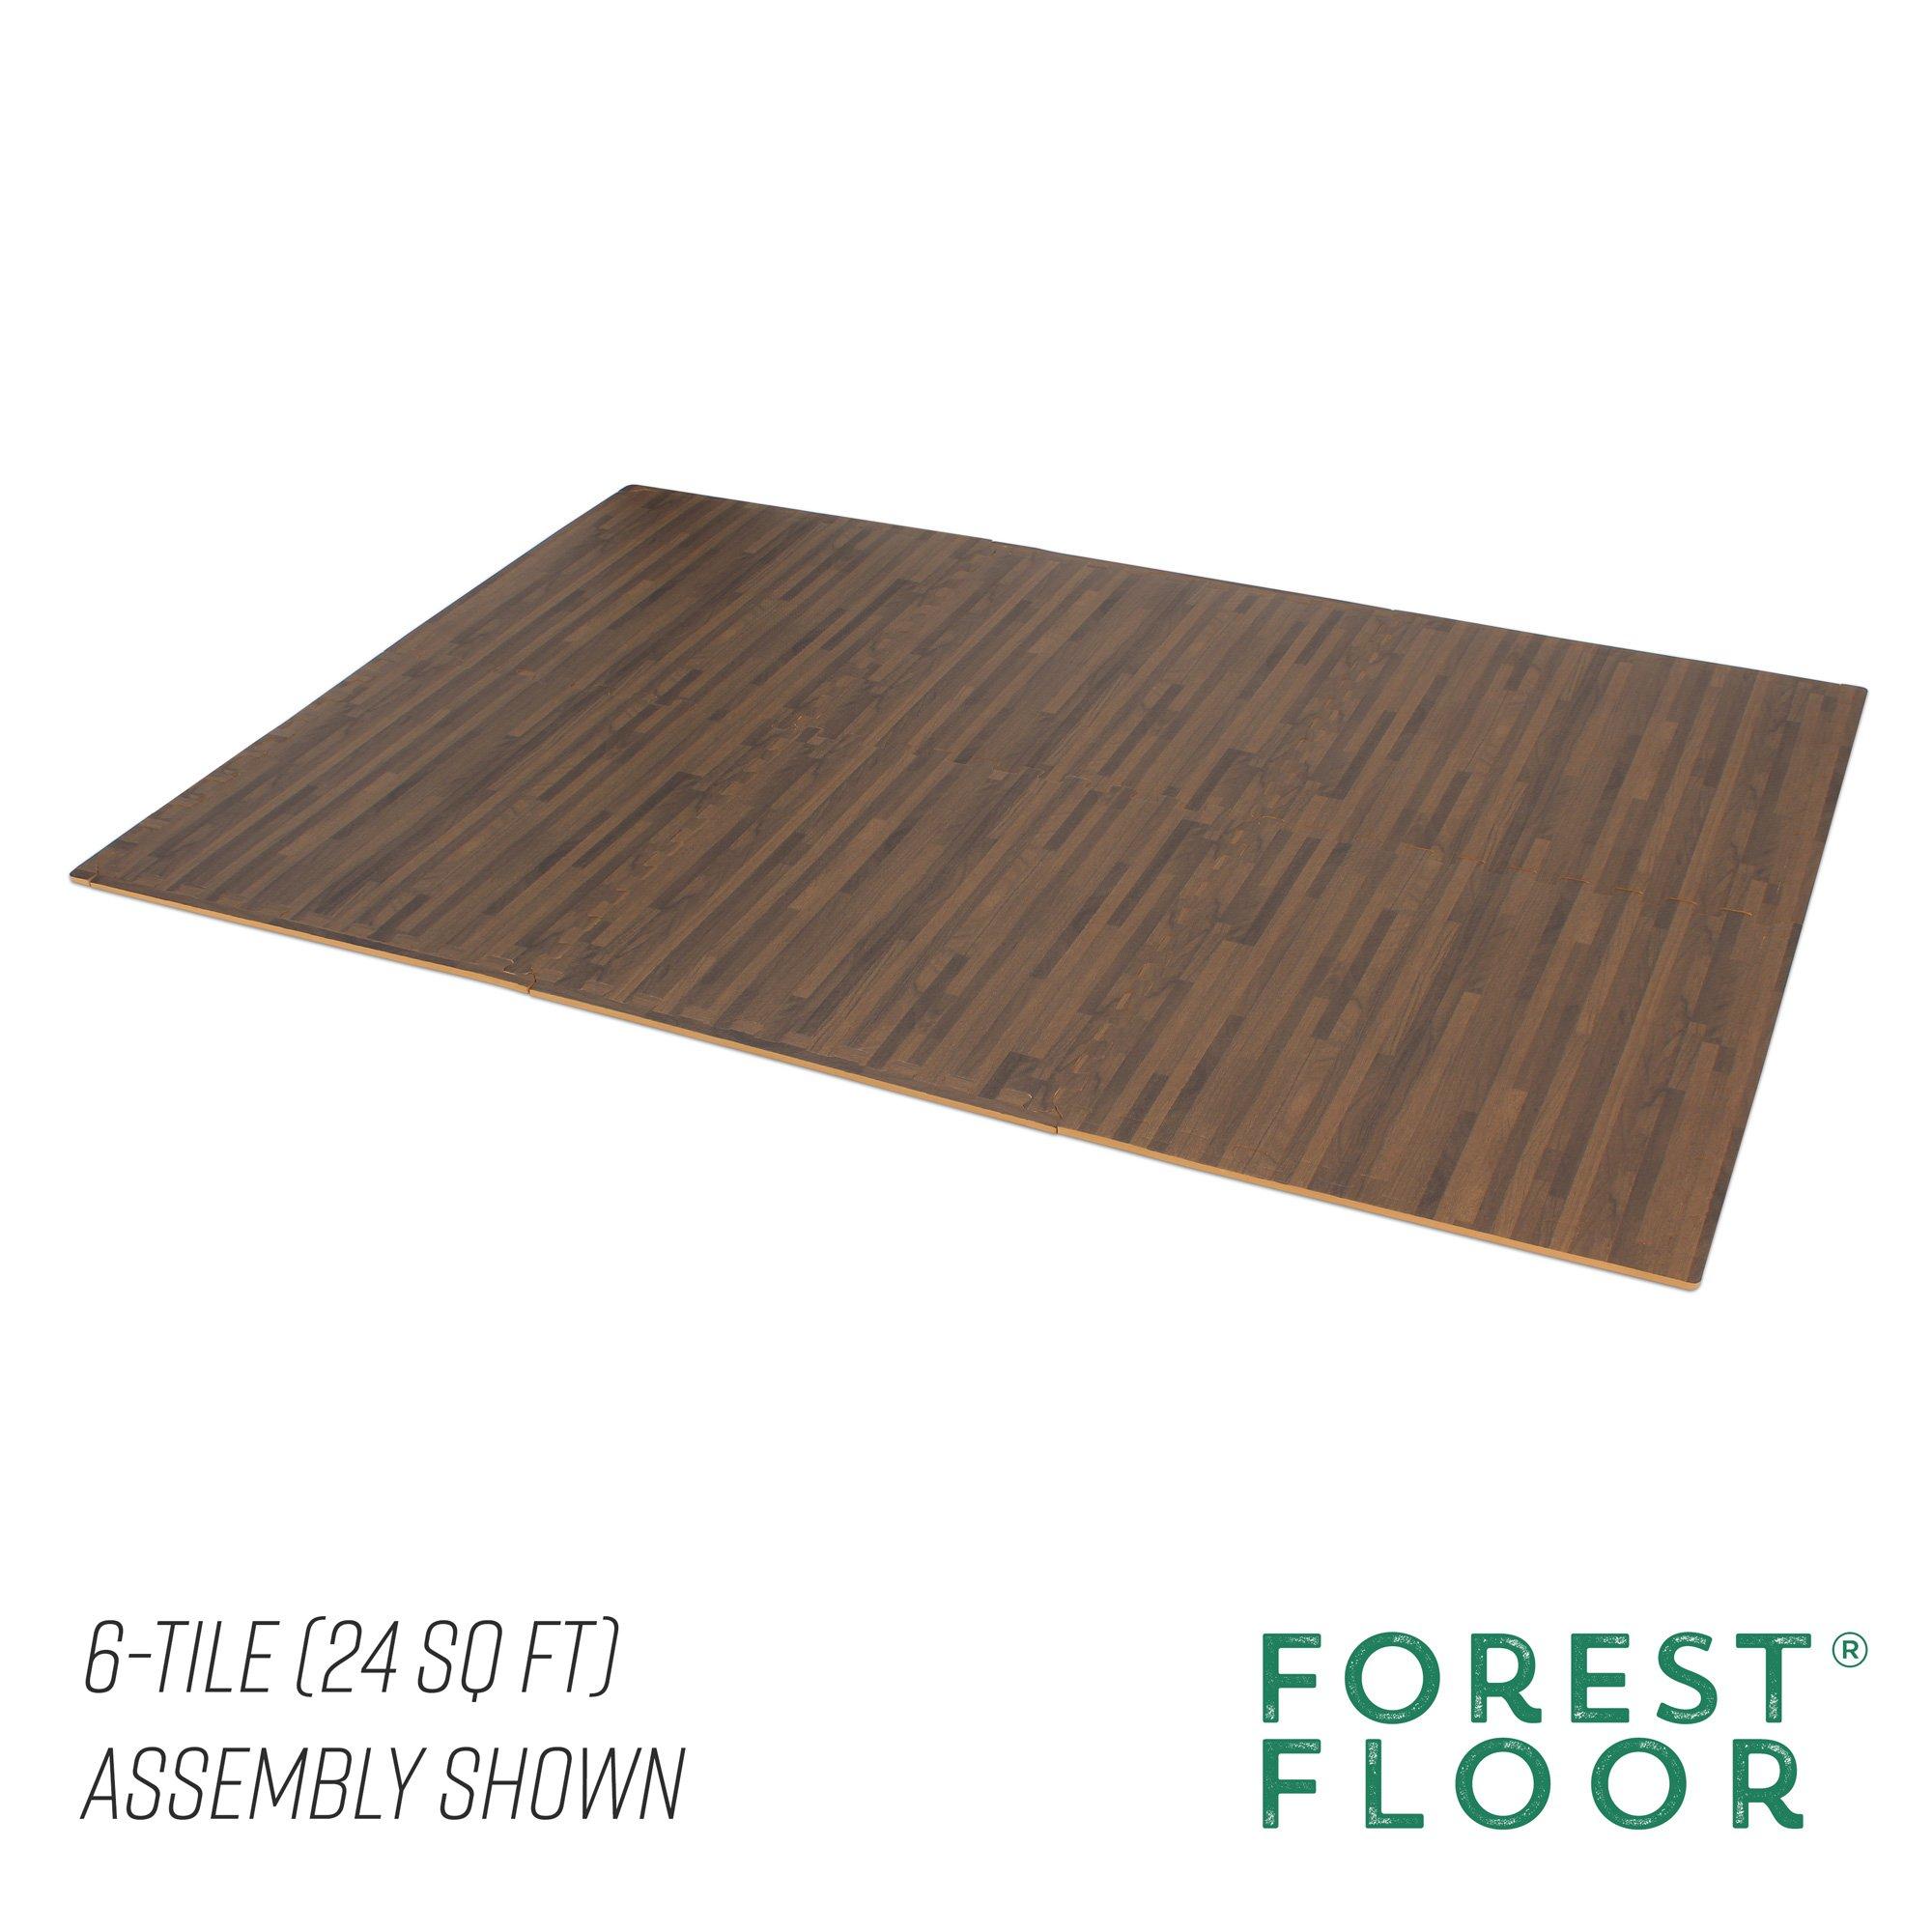 Forest Floor 3/8'' Thick Printed Wood Grain Interlocking Foam Floor Mats, 16 Sq Ft (4 Tiles), Walnut by Forest Floor (Image #5)